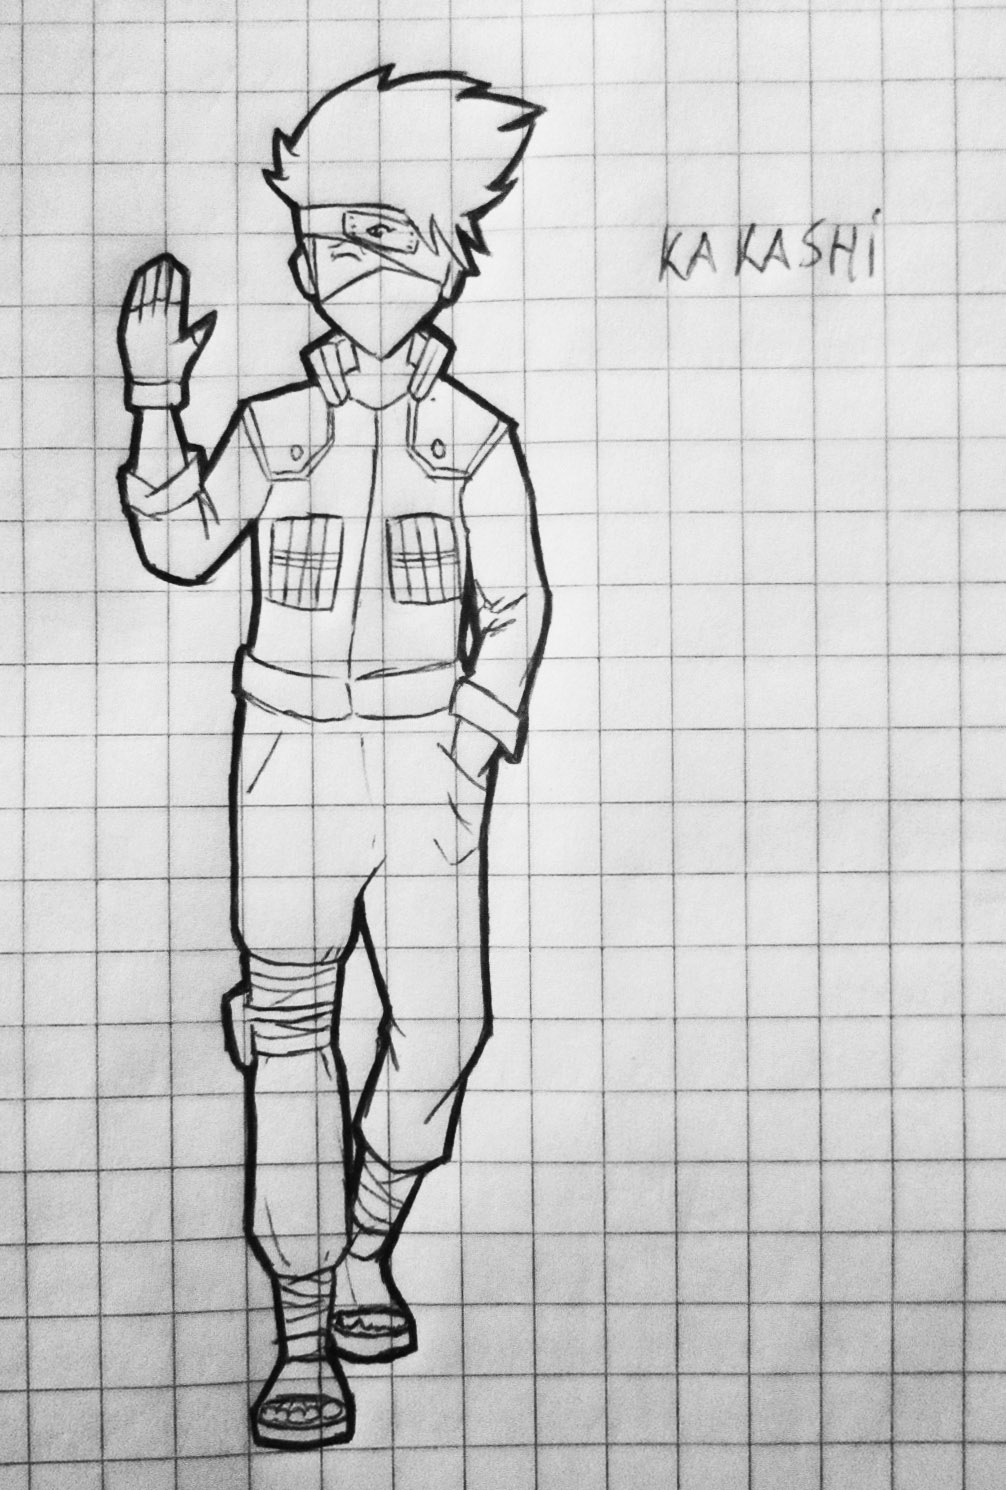 Kakashi dibujo random en clases by ConsuJay on DeviantArt